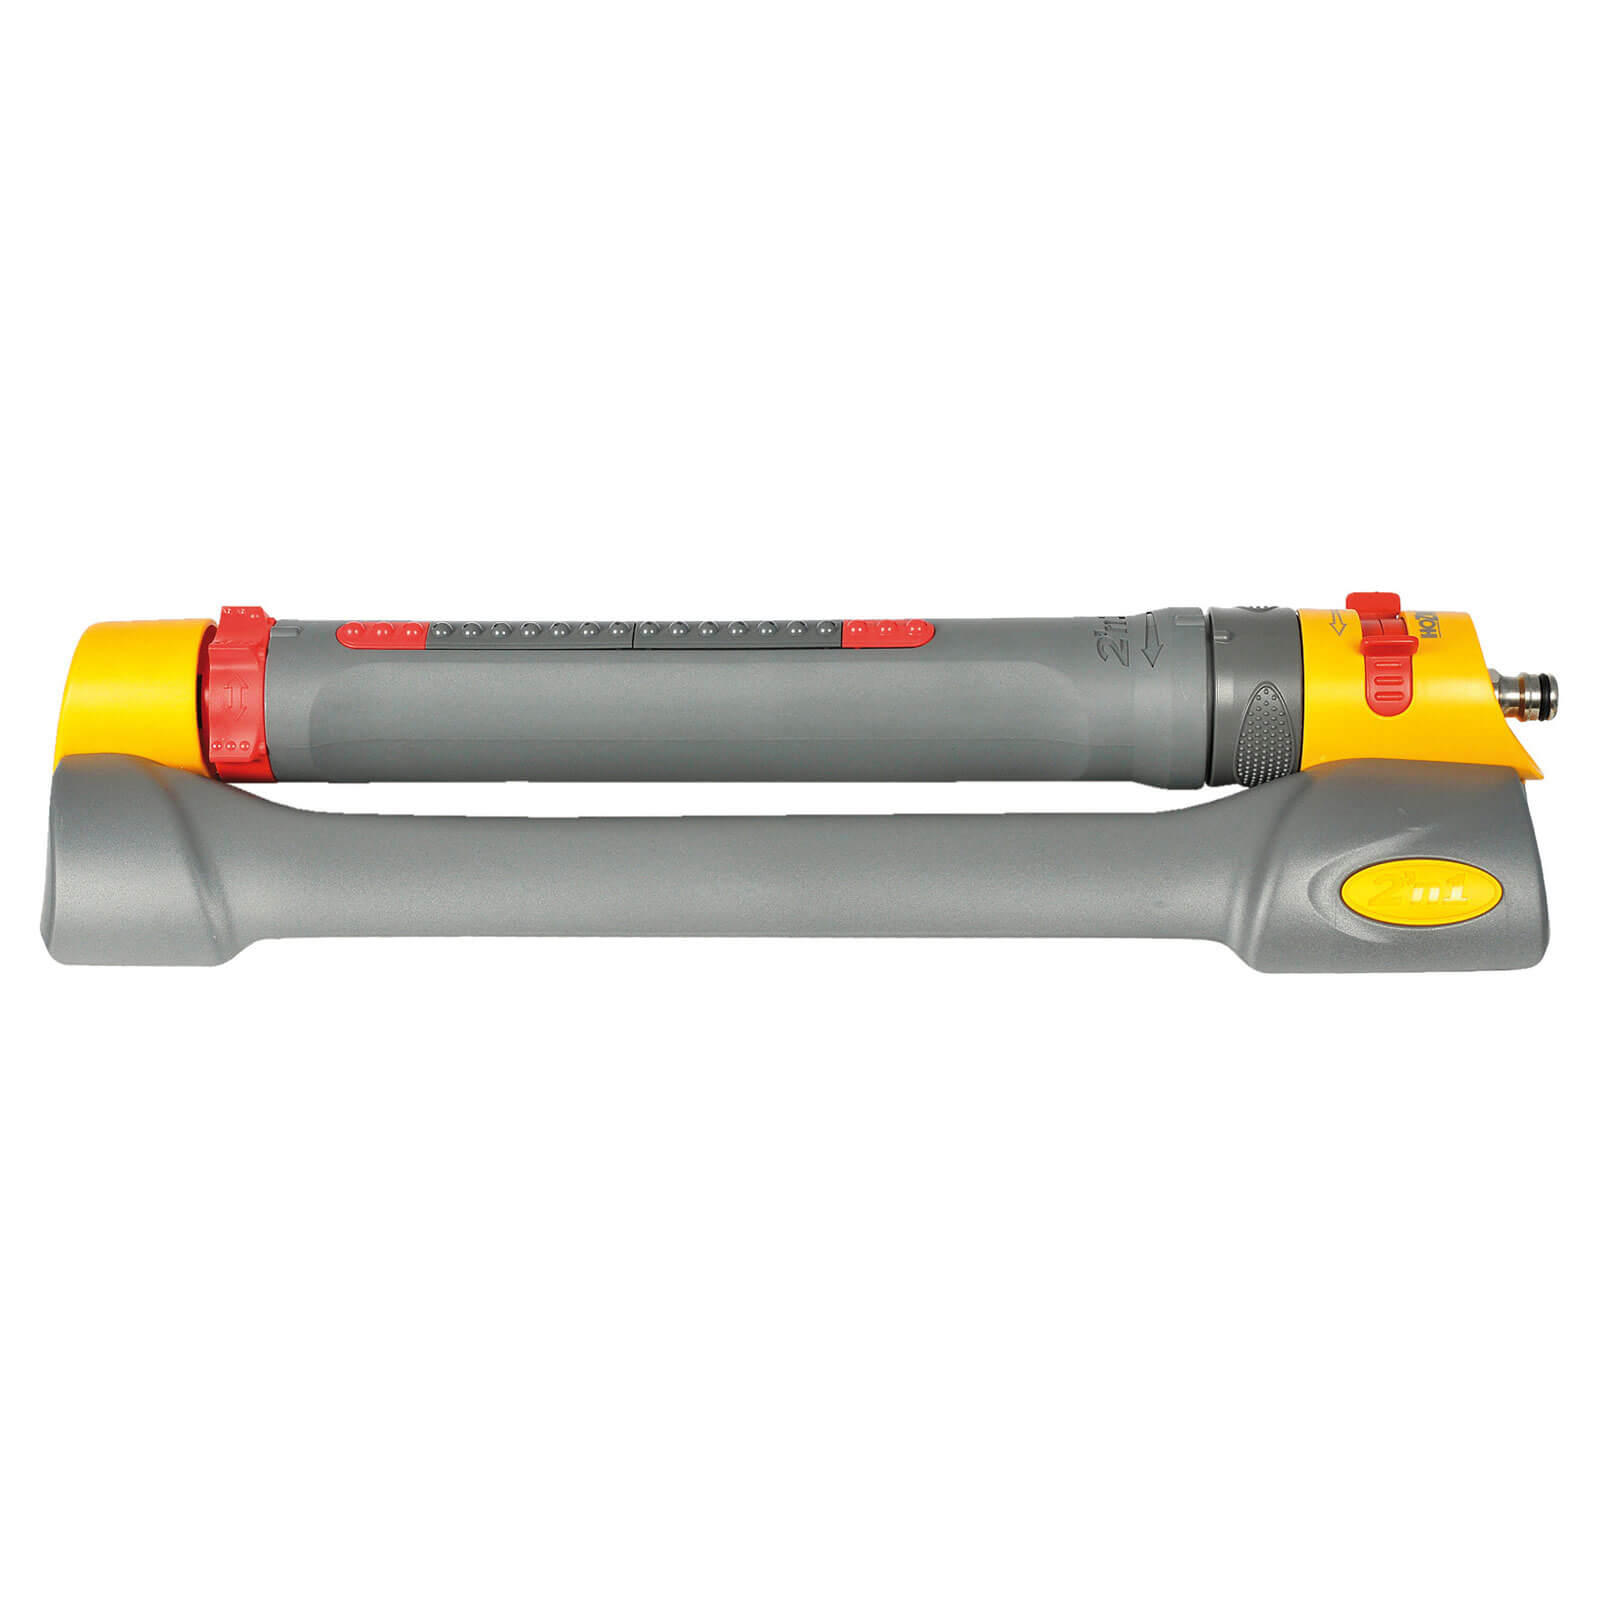 Hozelock Rectangular Oscillating Garden Water Sprinkler Pro with 2 Spray Patterns Max Coverage 320m2